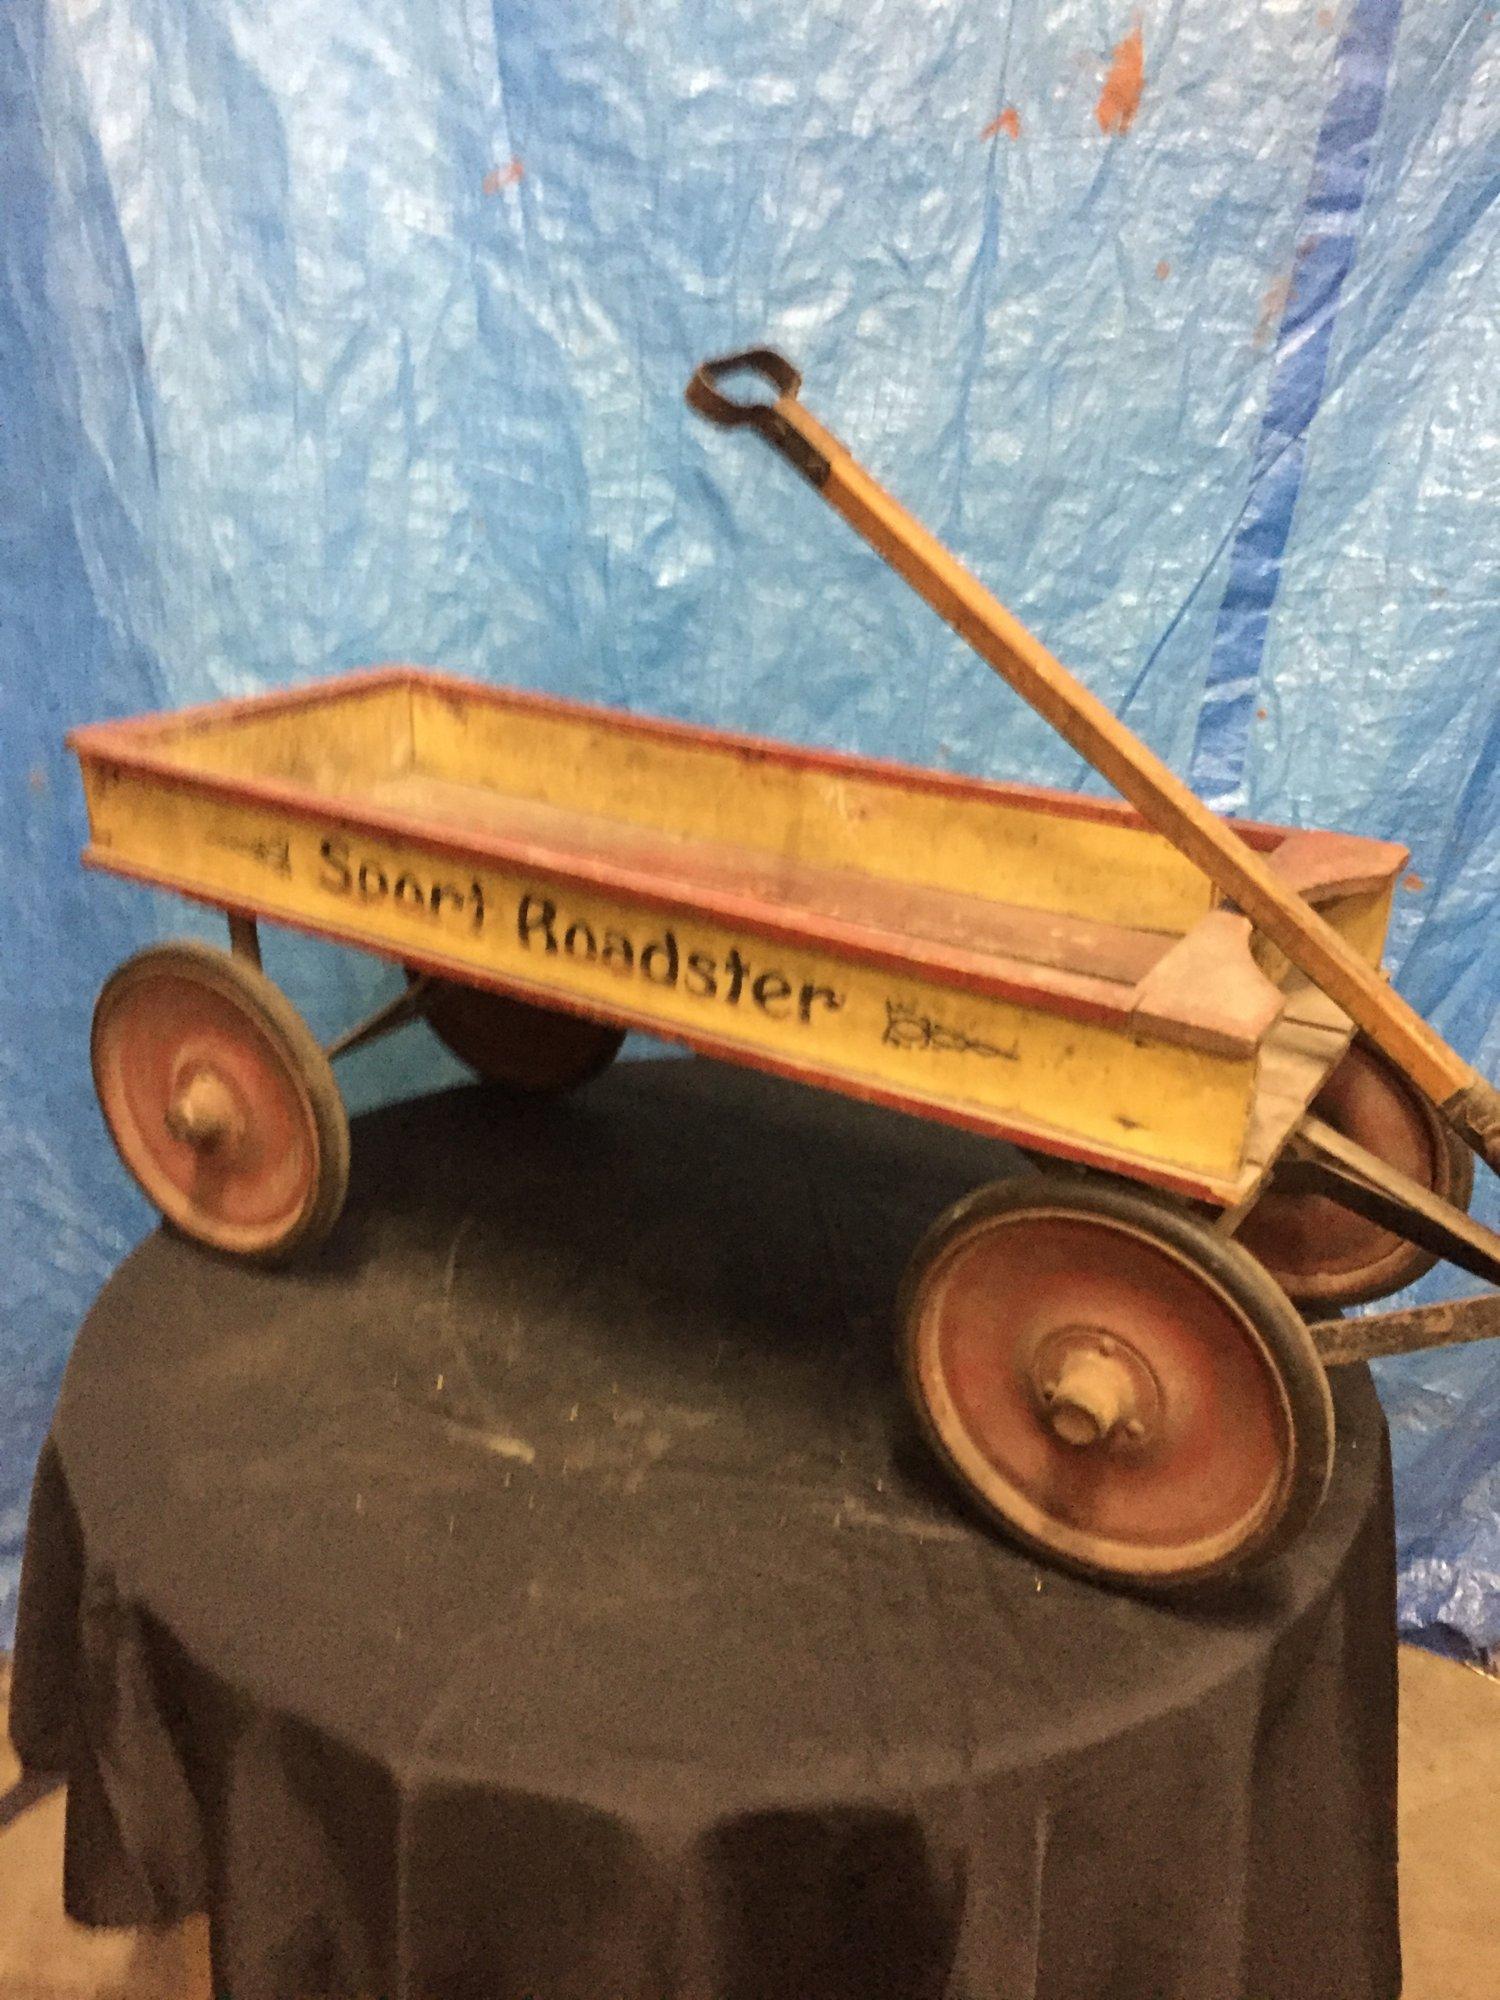 Vintage Sport Roadster Wagon - $375.jpg